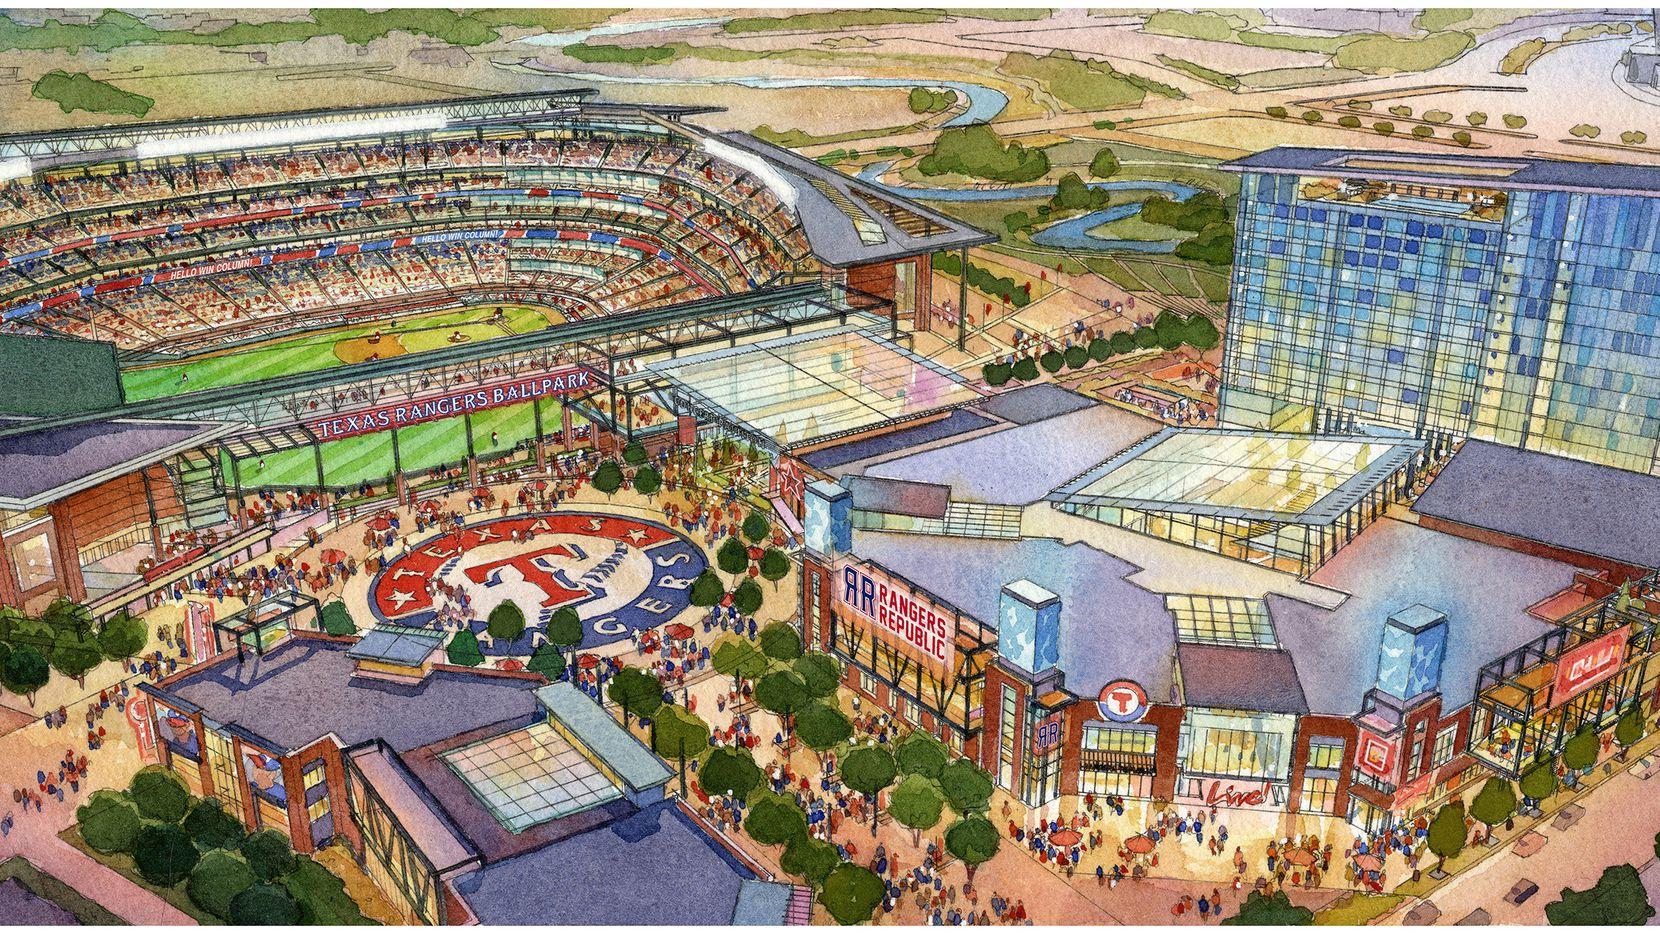 Proposed $1 billion Texas Rangers stadium alongside planned Texas Live! entertainment development.